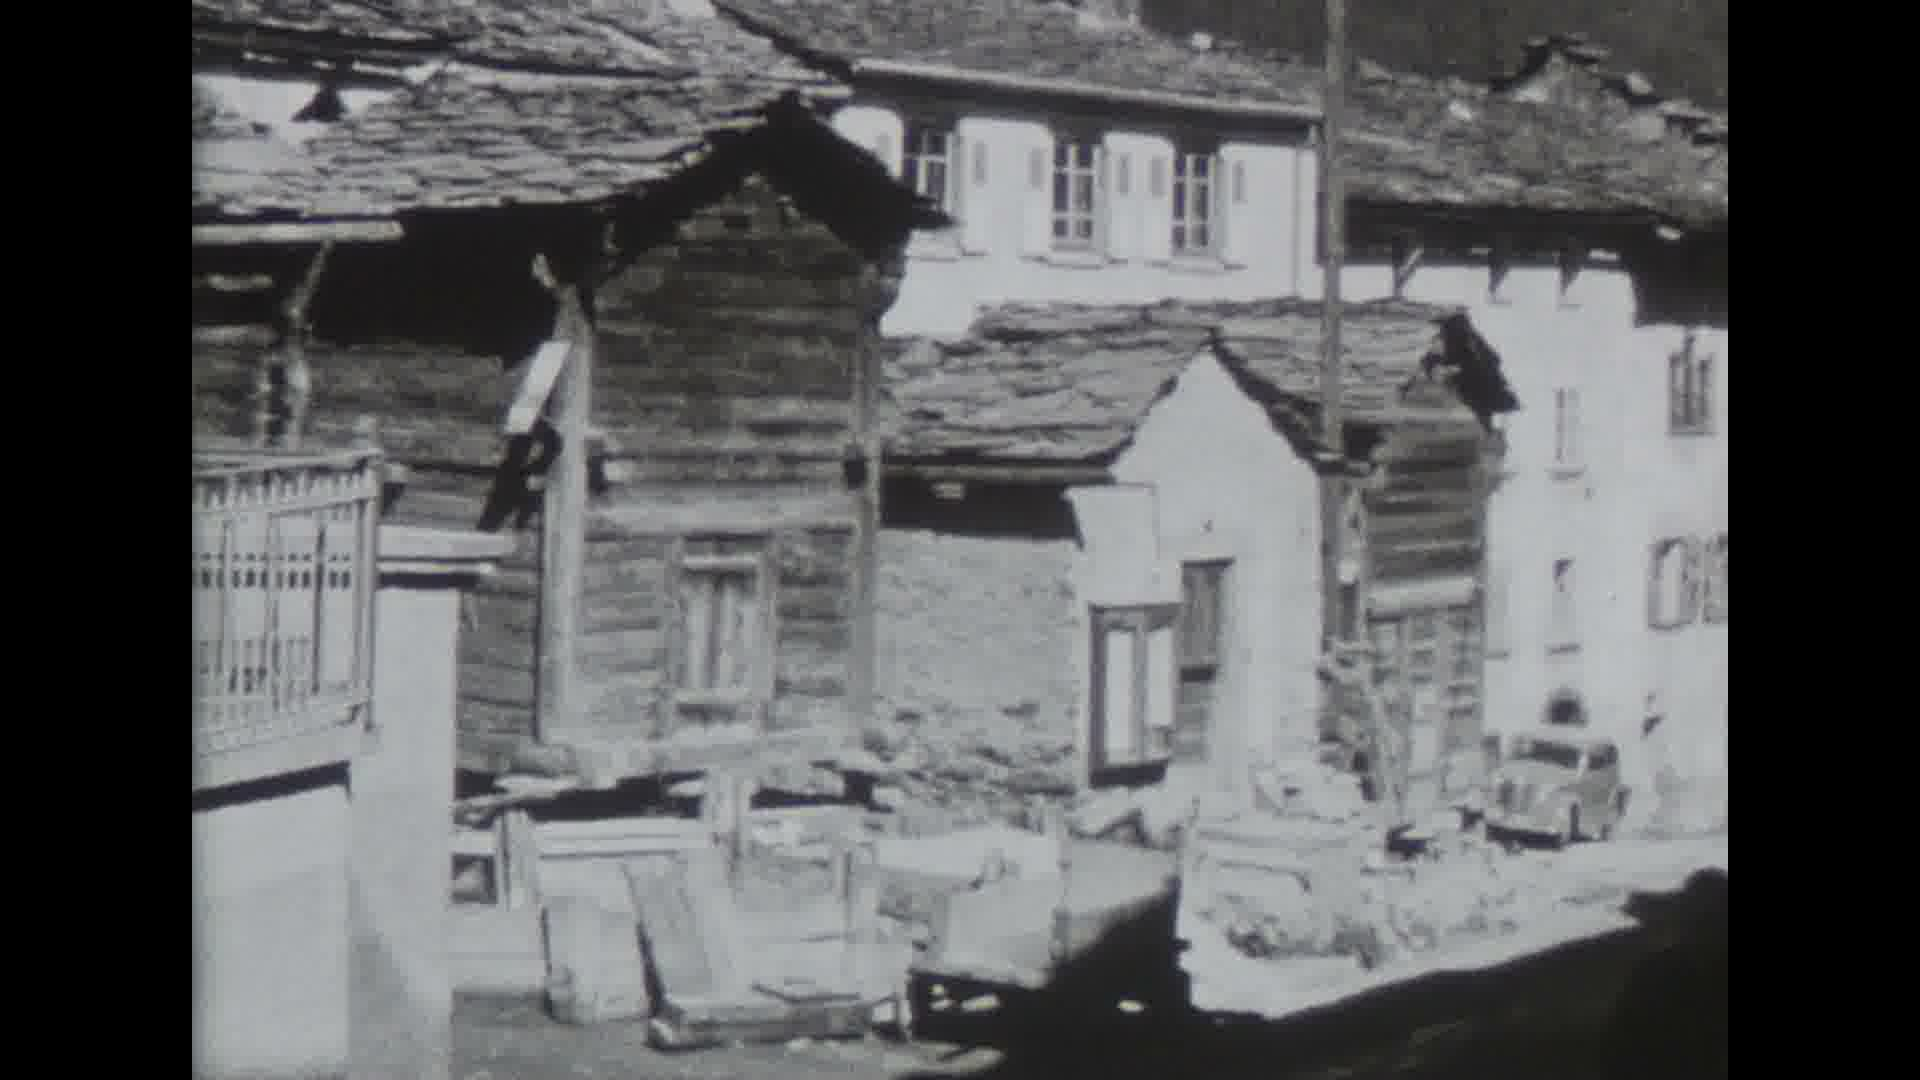 Haute Route, de Chamonix à Zermatt